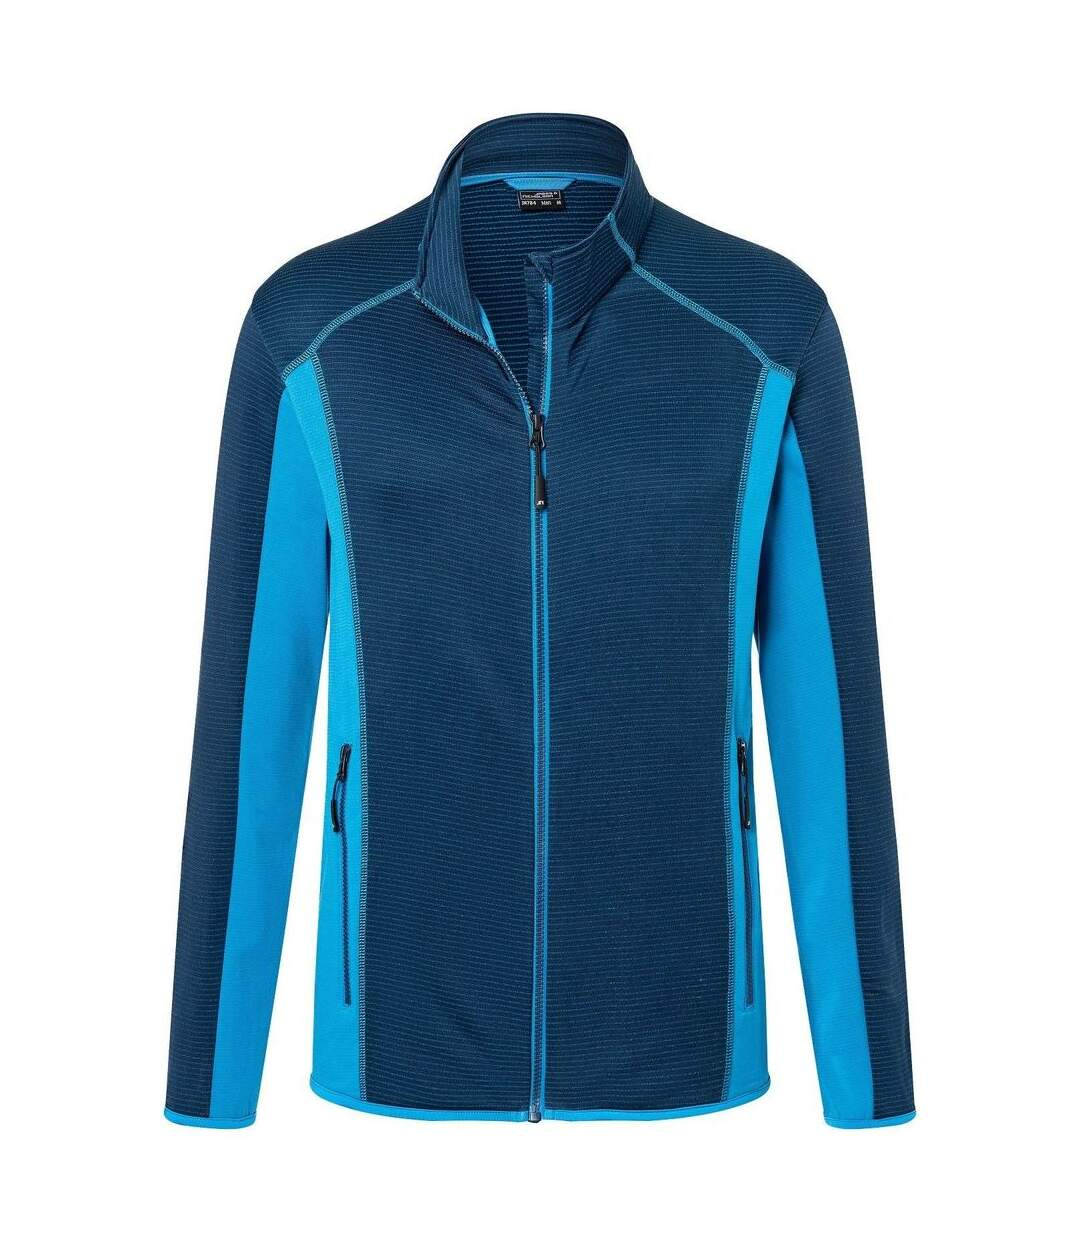 Veste polaire - Homme - JN784 - bleu marine